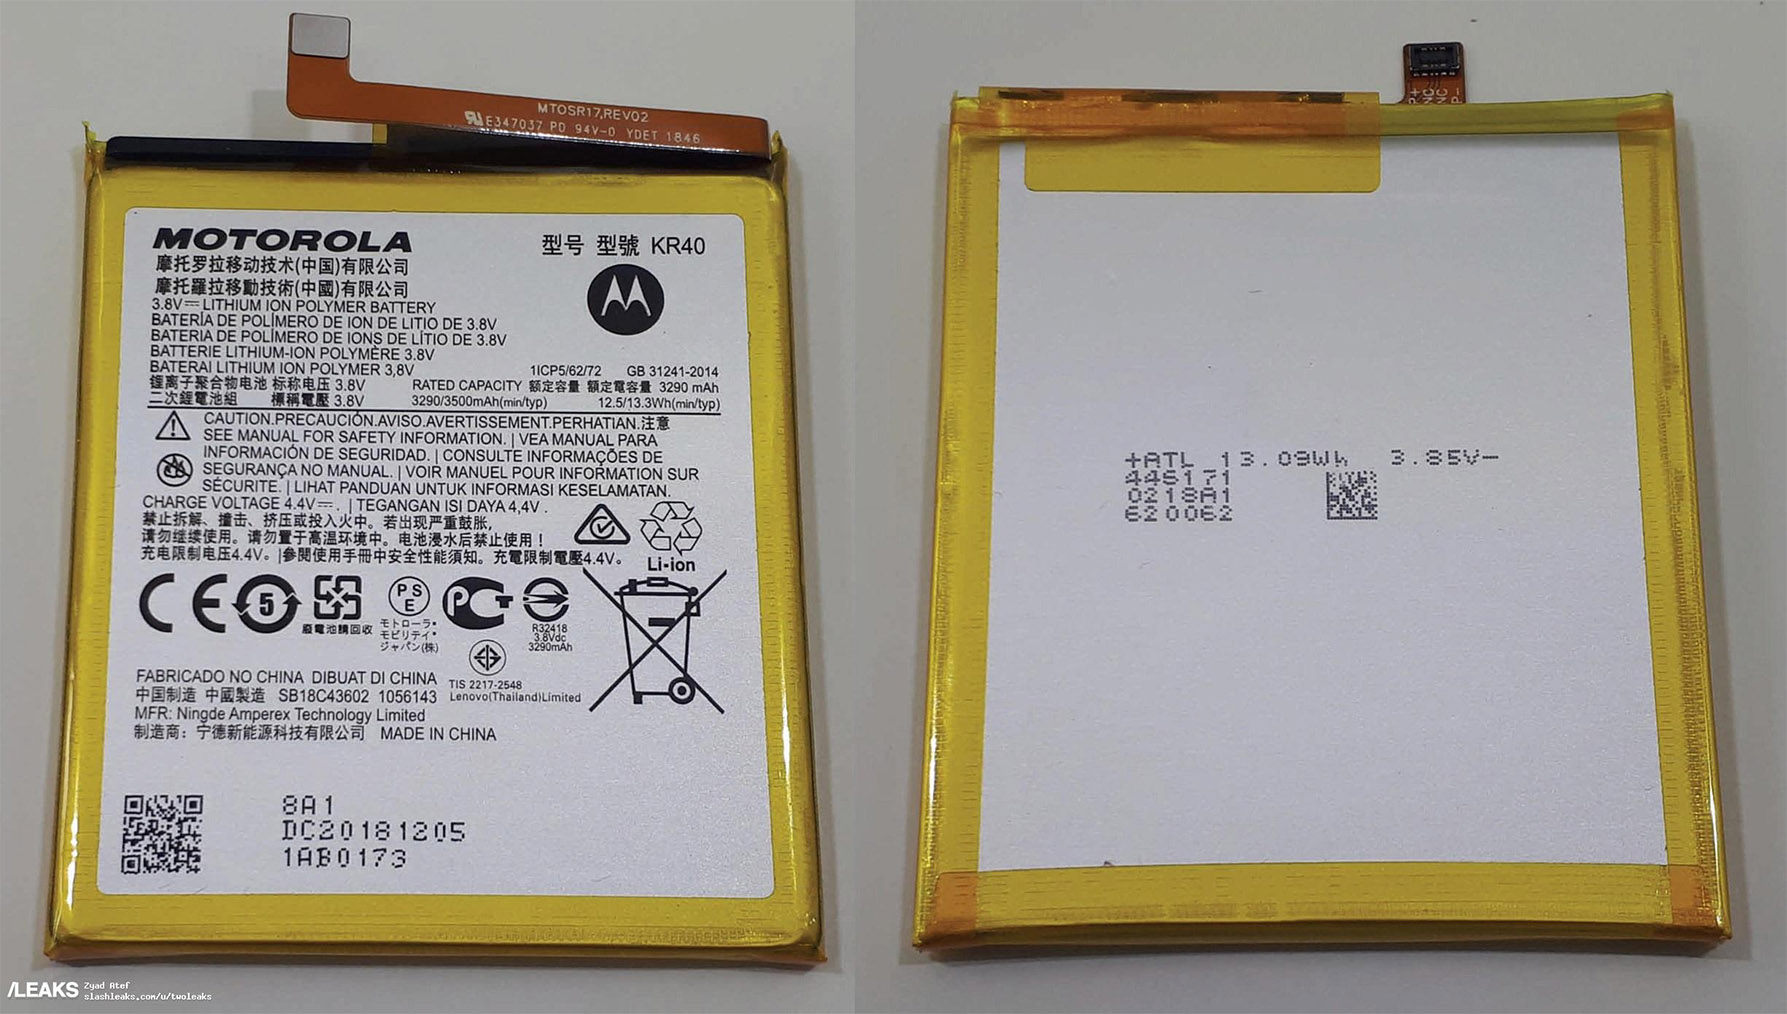 Motorola One Vision battery